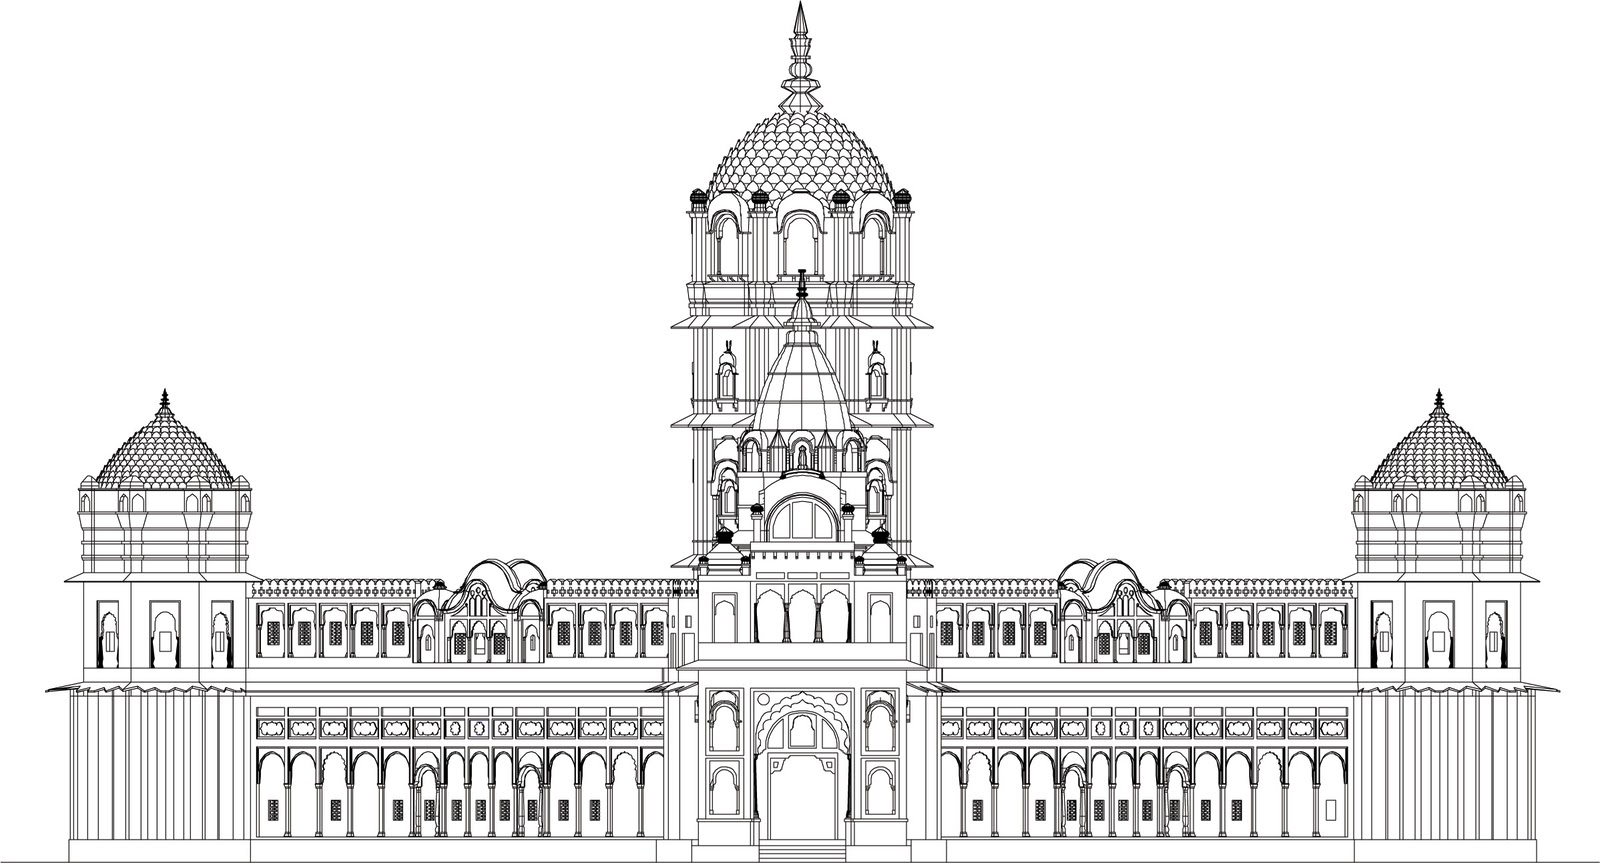 Laxmi Narayan Temple  Orchha  Documentation of monuments for INTACH  New  Delhi Architecture  Laxmi Narayan Temple  Orchha  Documentation of  . Indian Temple Architecture Pdf. Home Design Ideas